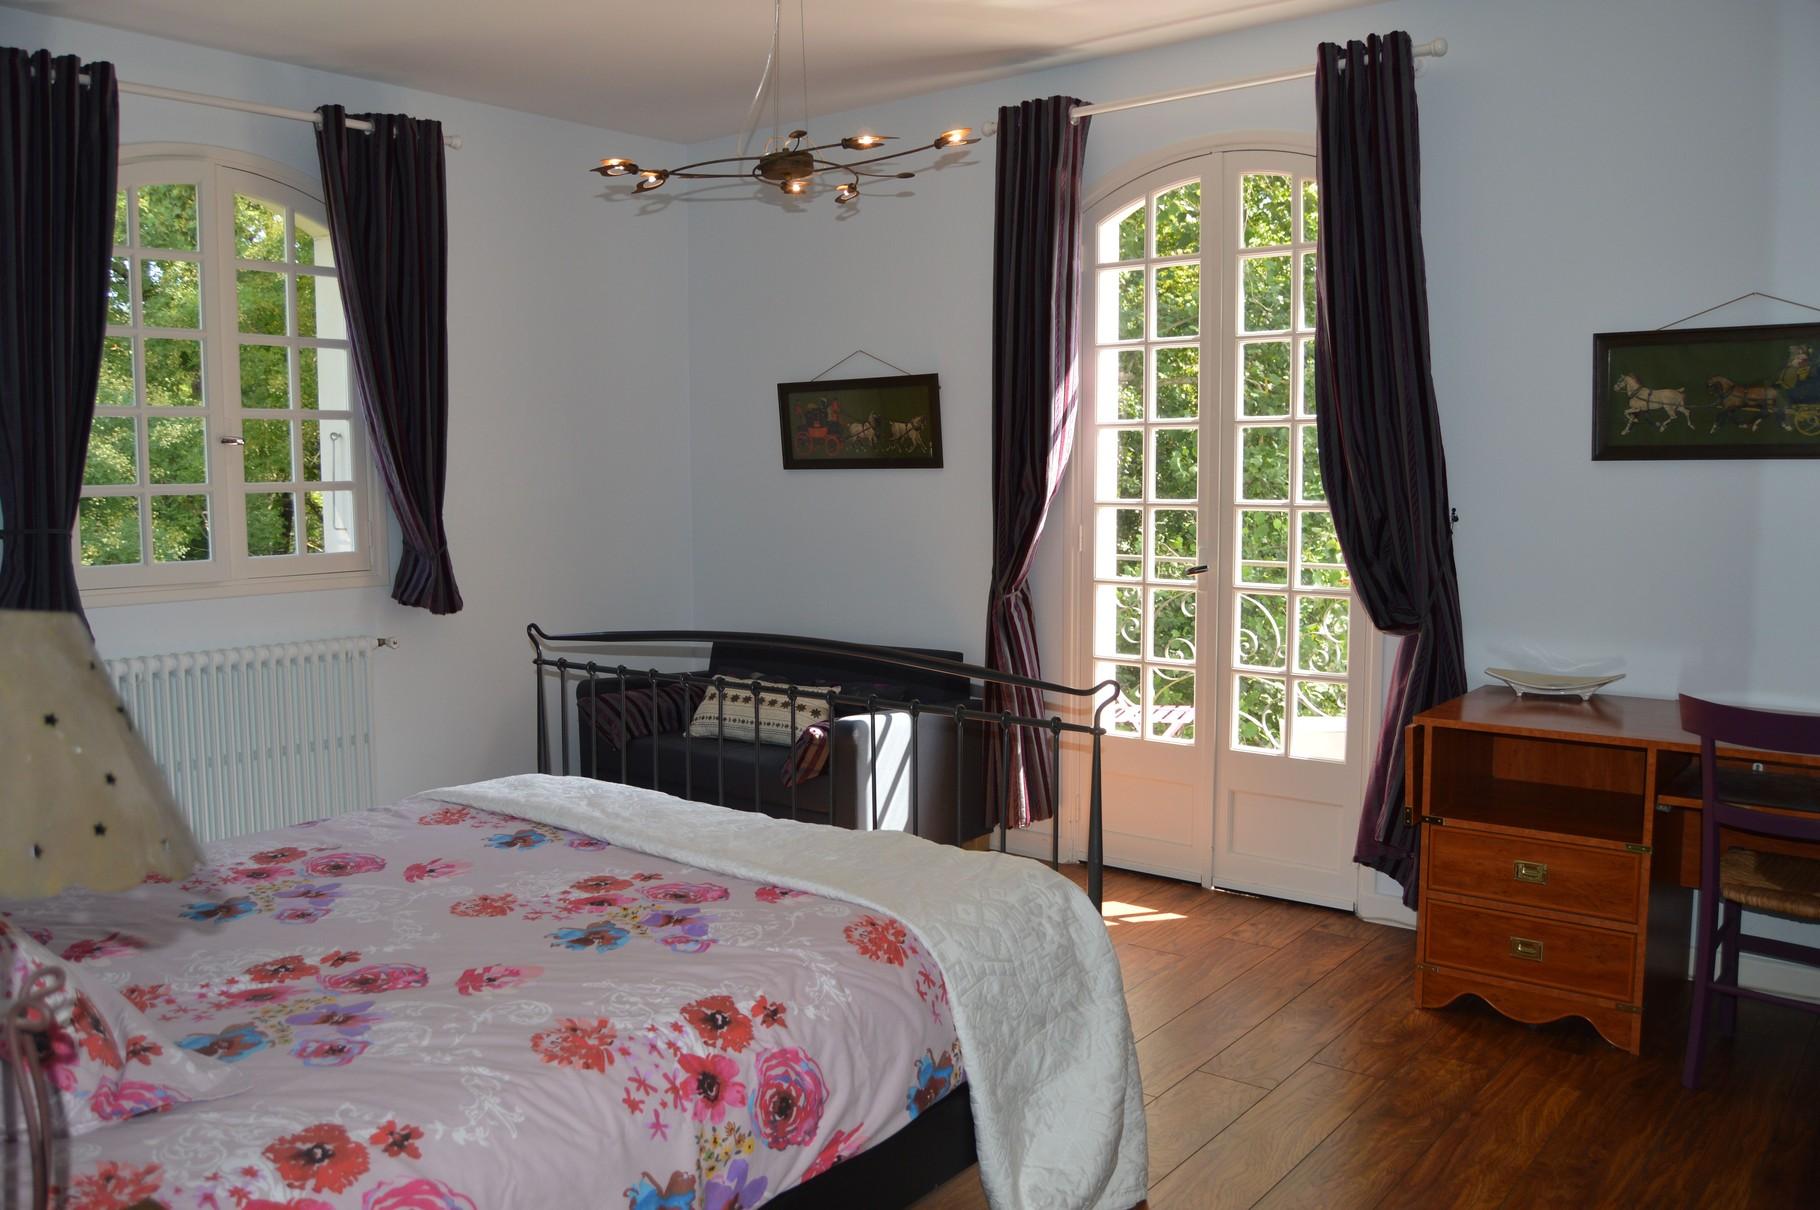 Maison chambres chambres d 39 h tes l 39 escal re for Rochefort chambre d hotes